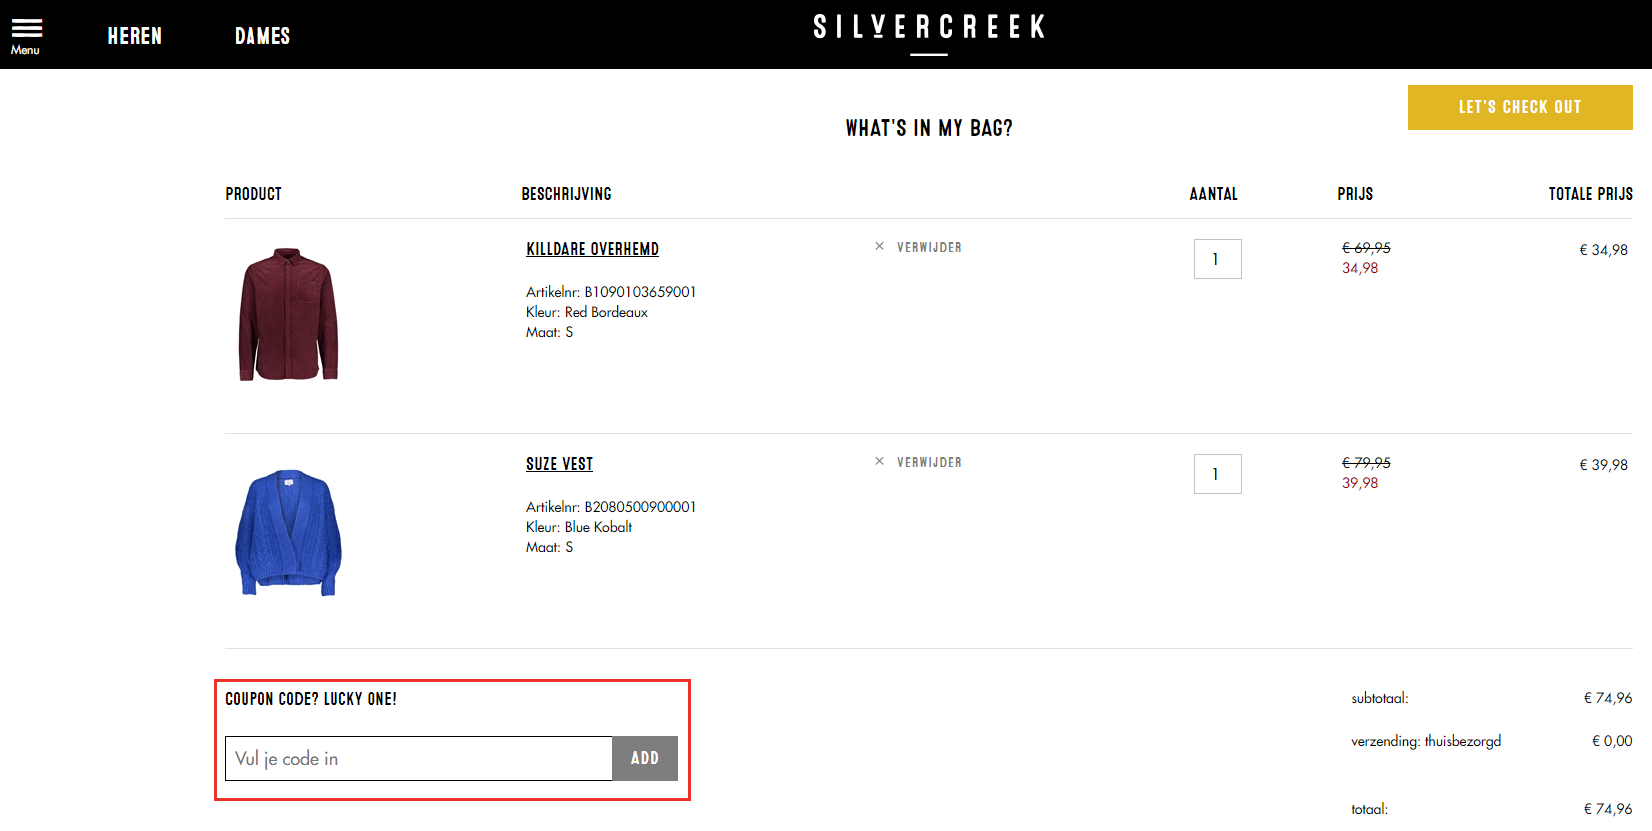 Silvercreek kortingscode gebruiken